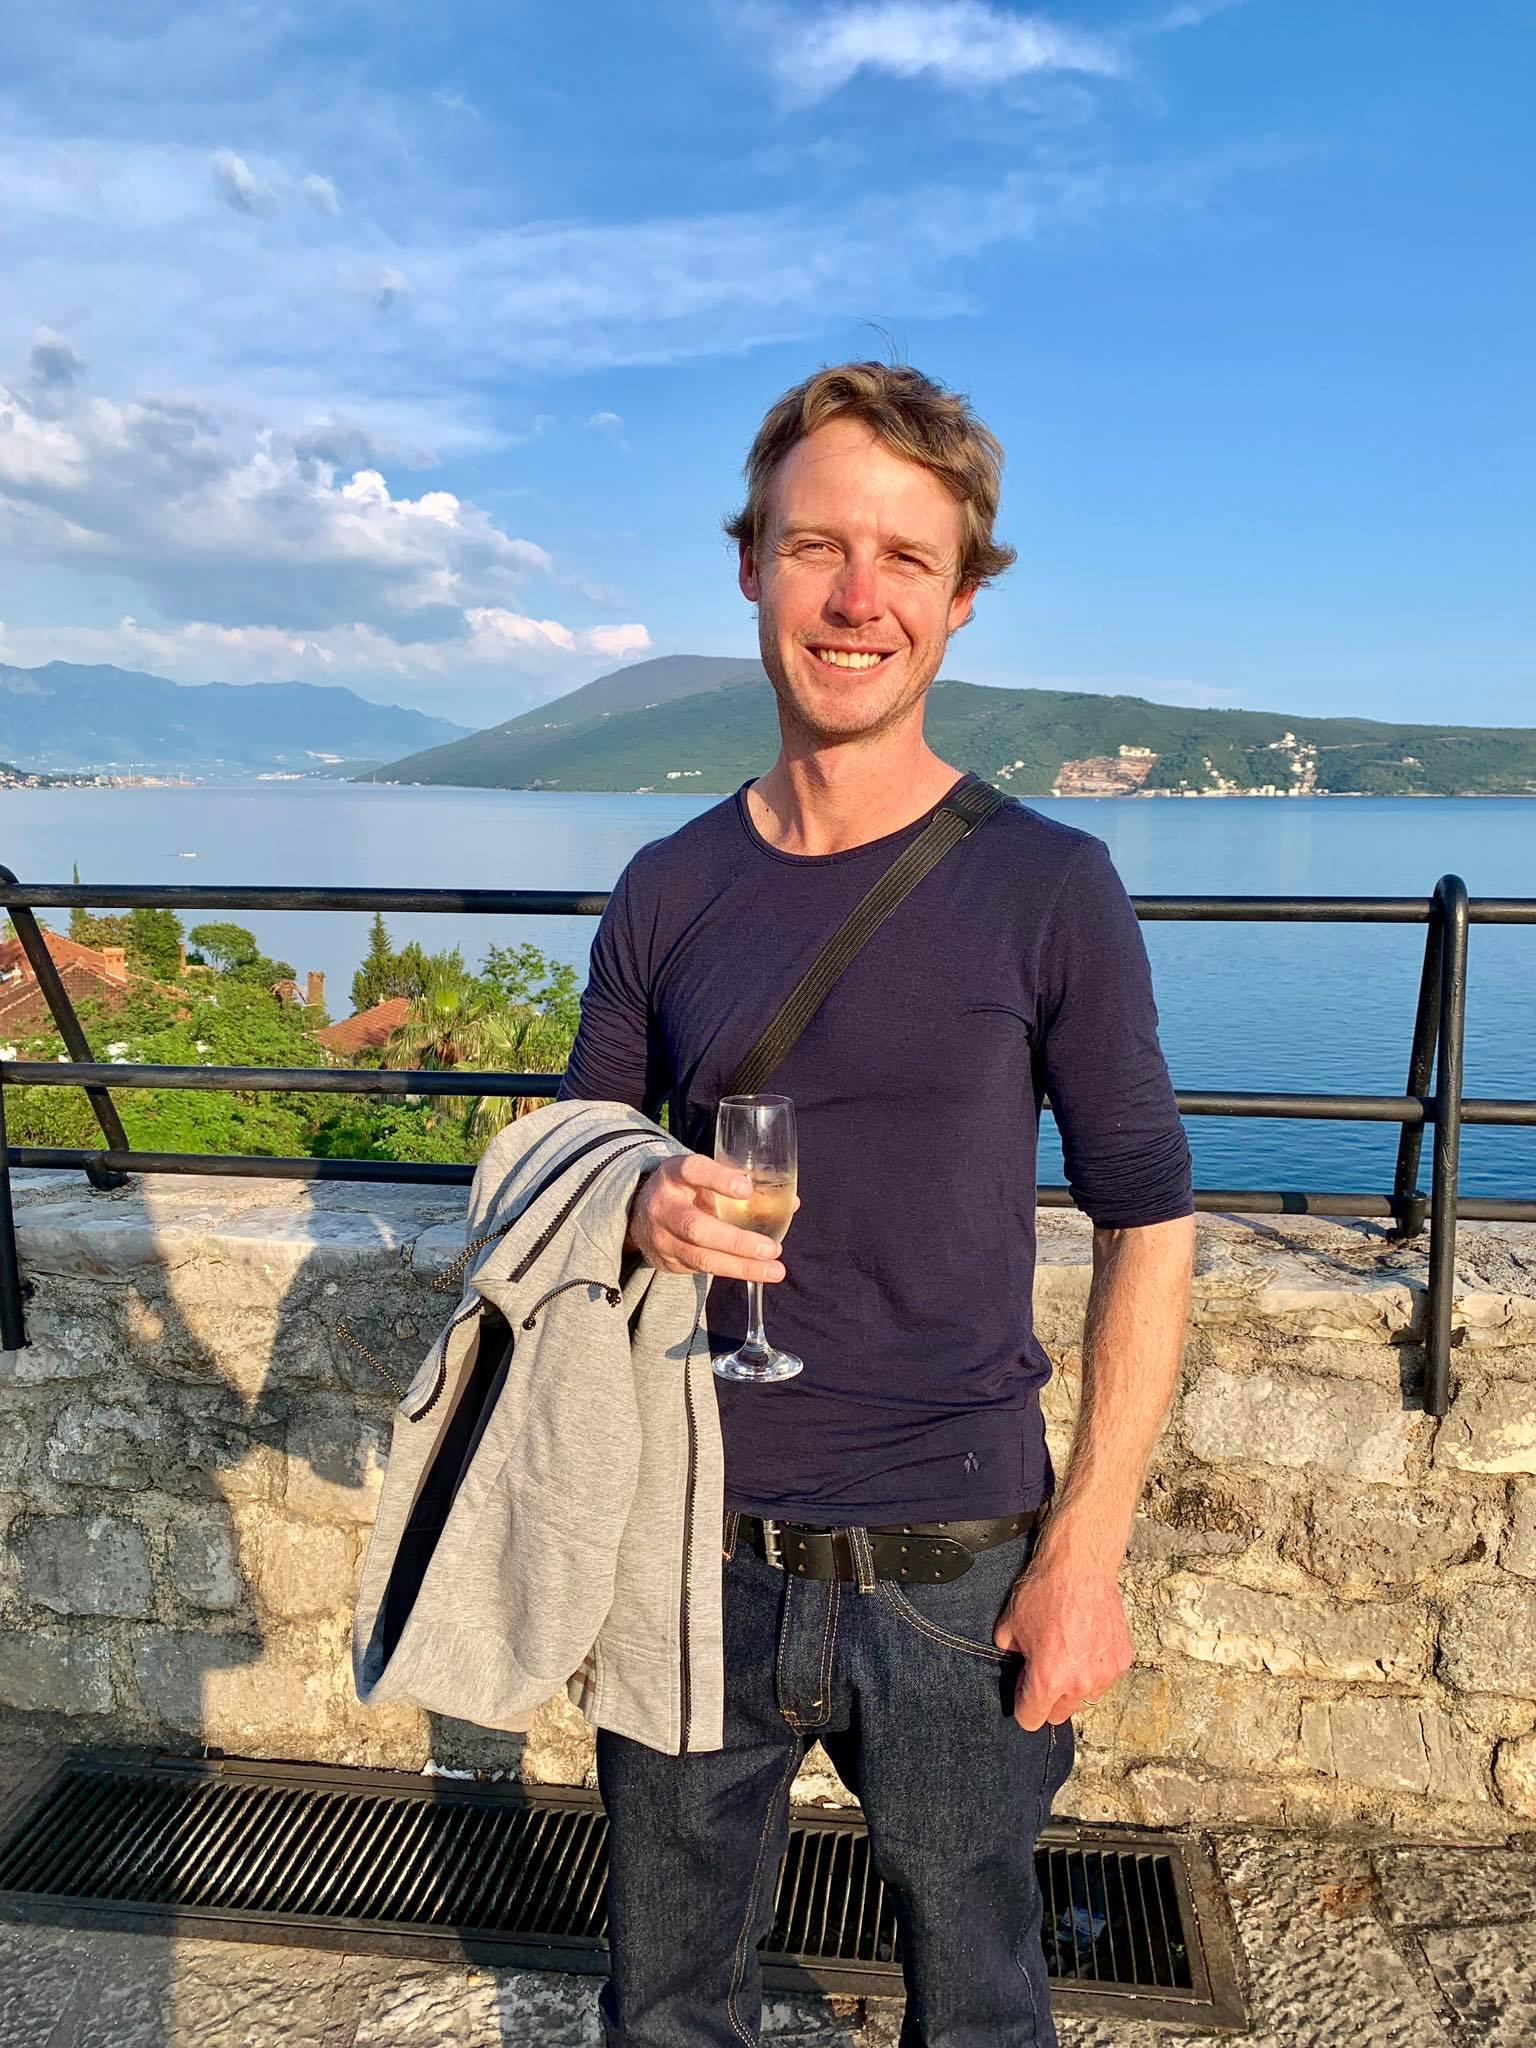 Expat Life in Montenegro Day 2 First full day in Herceg Novi12.jpg